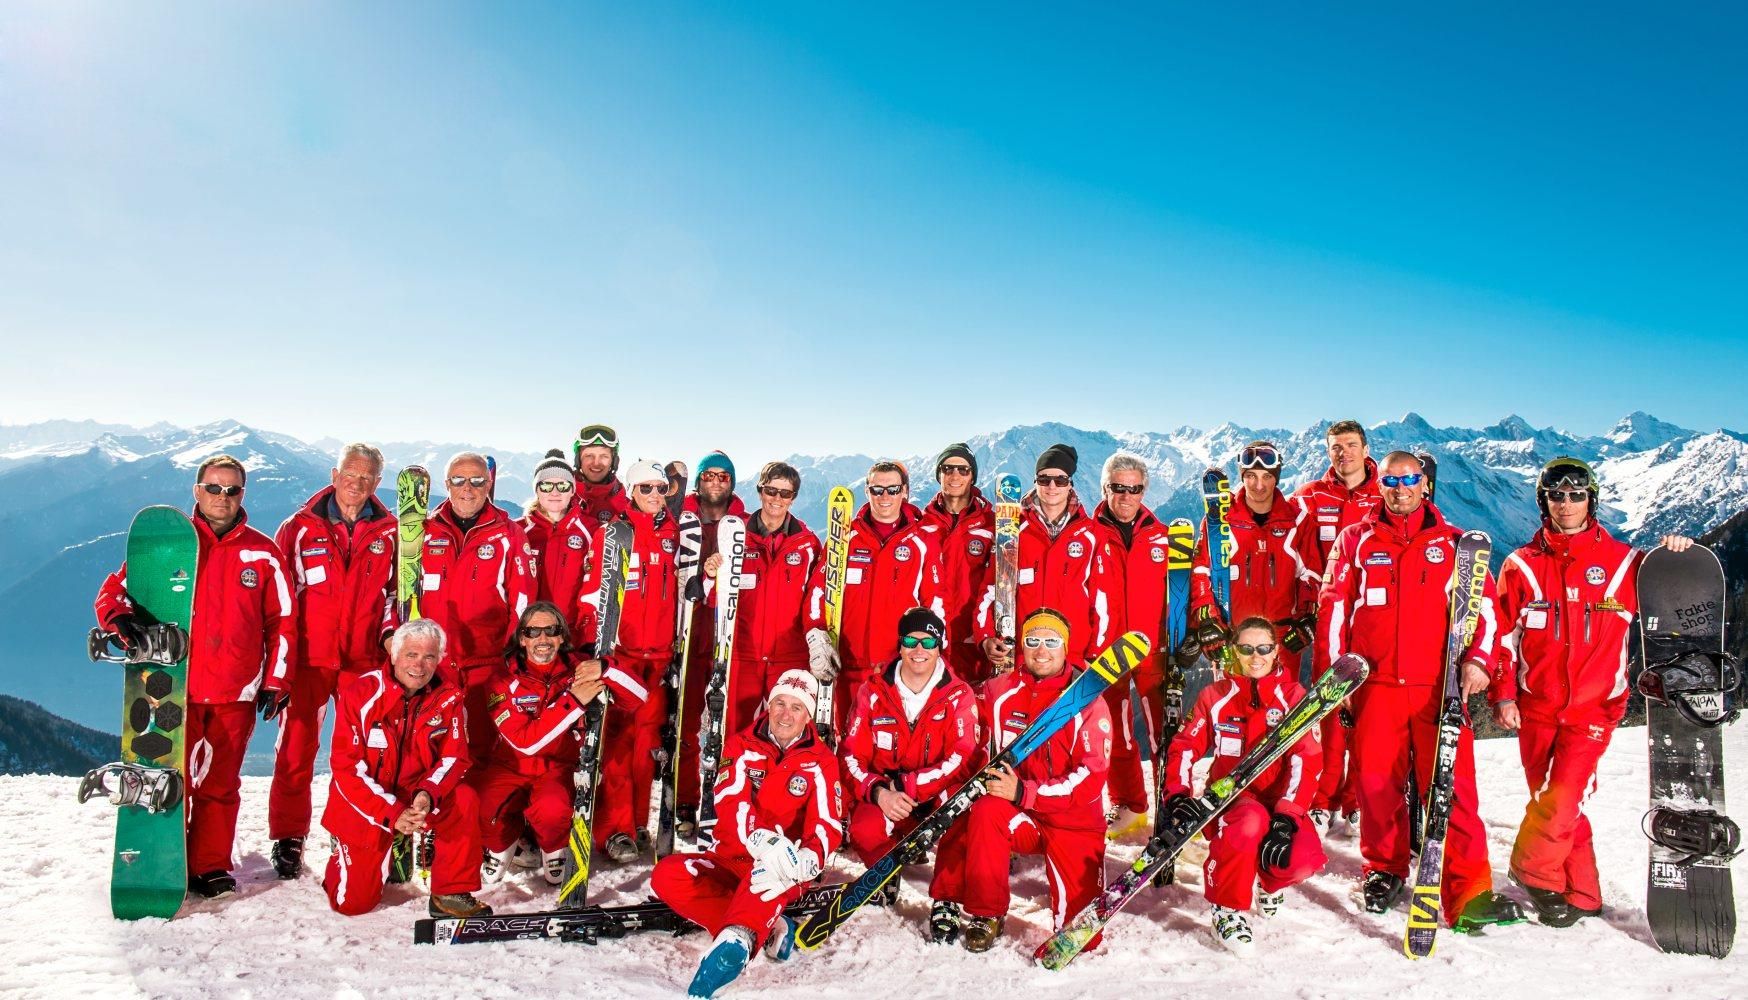 Merano 2000 Ski school